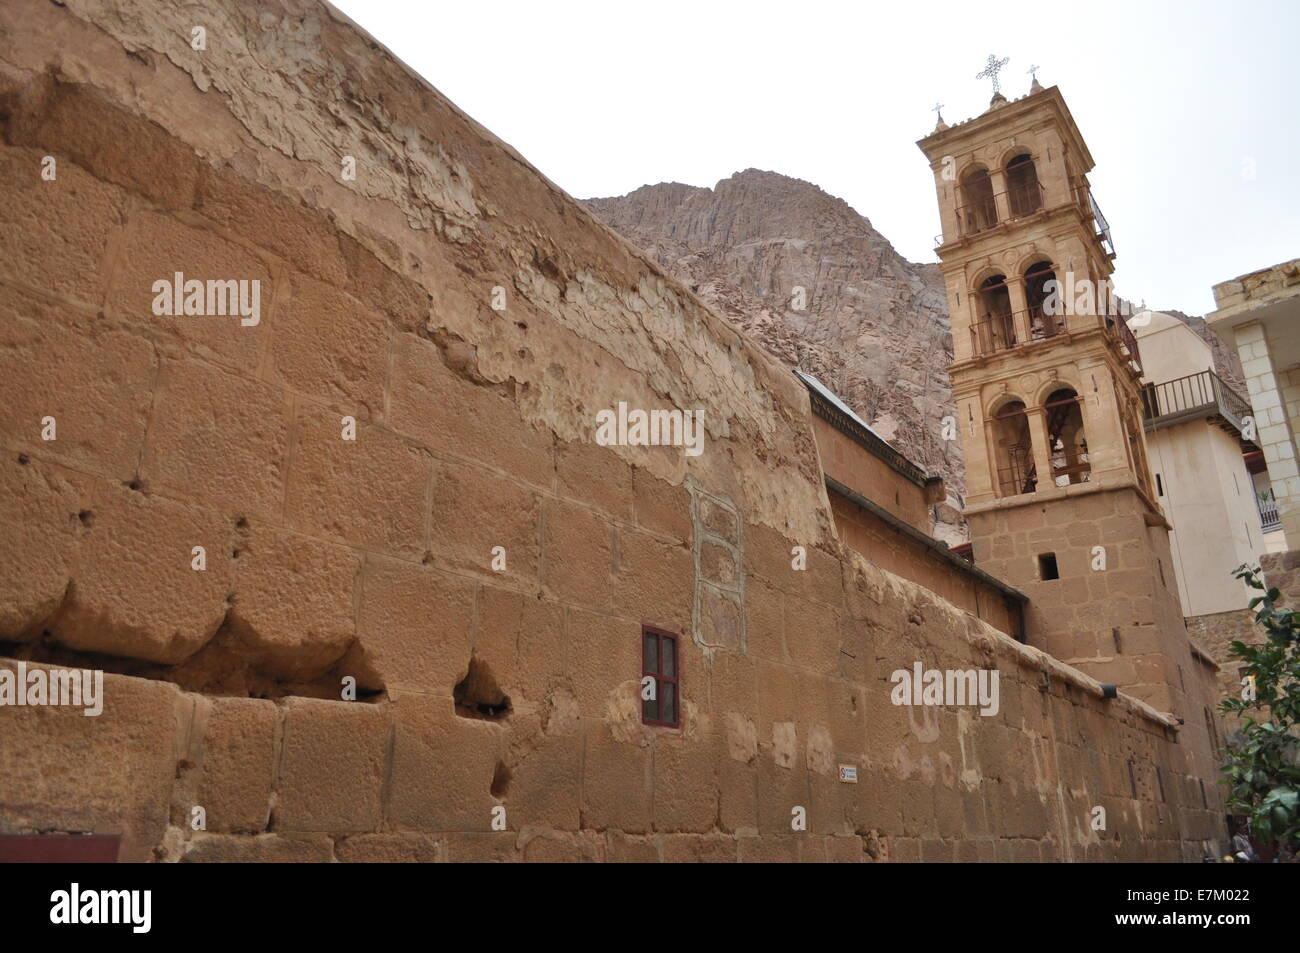 Egypt: Saint Catherine's Monastery at Mount Sinai - Stock Image